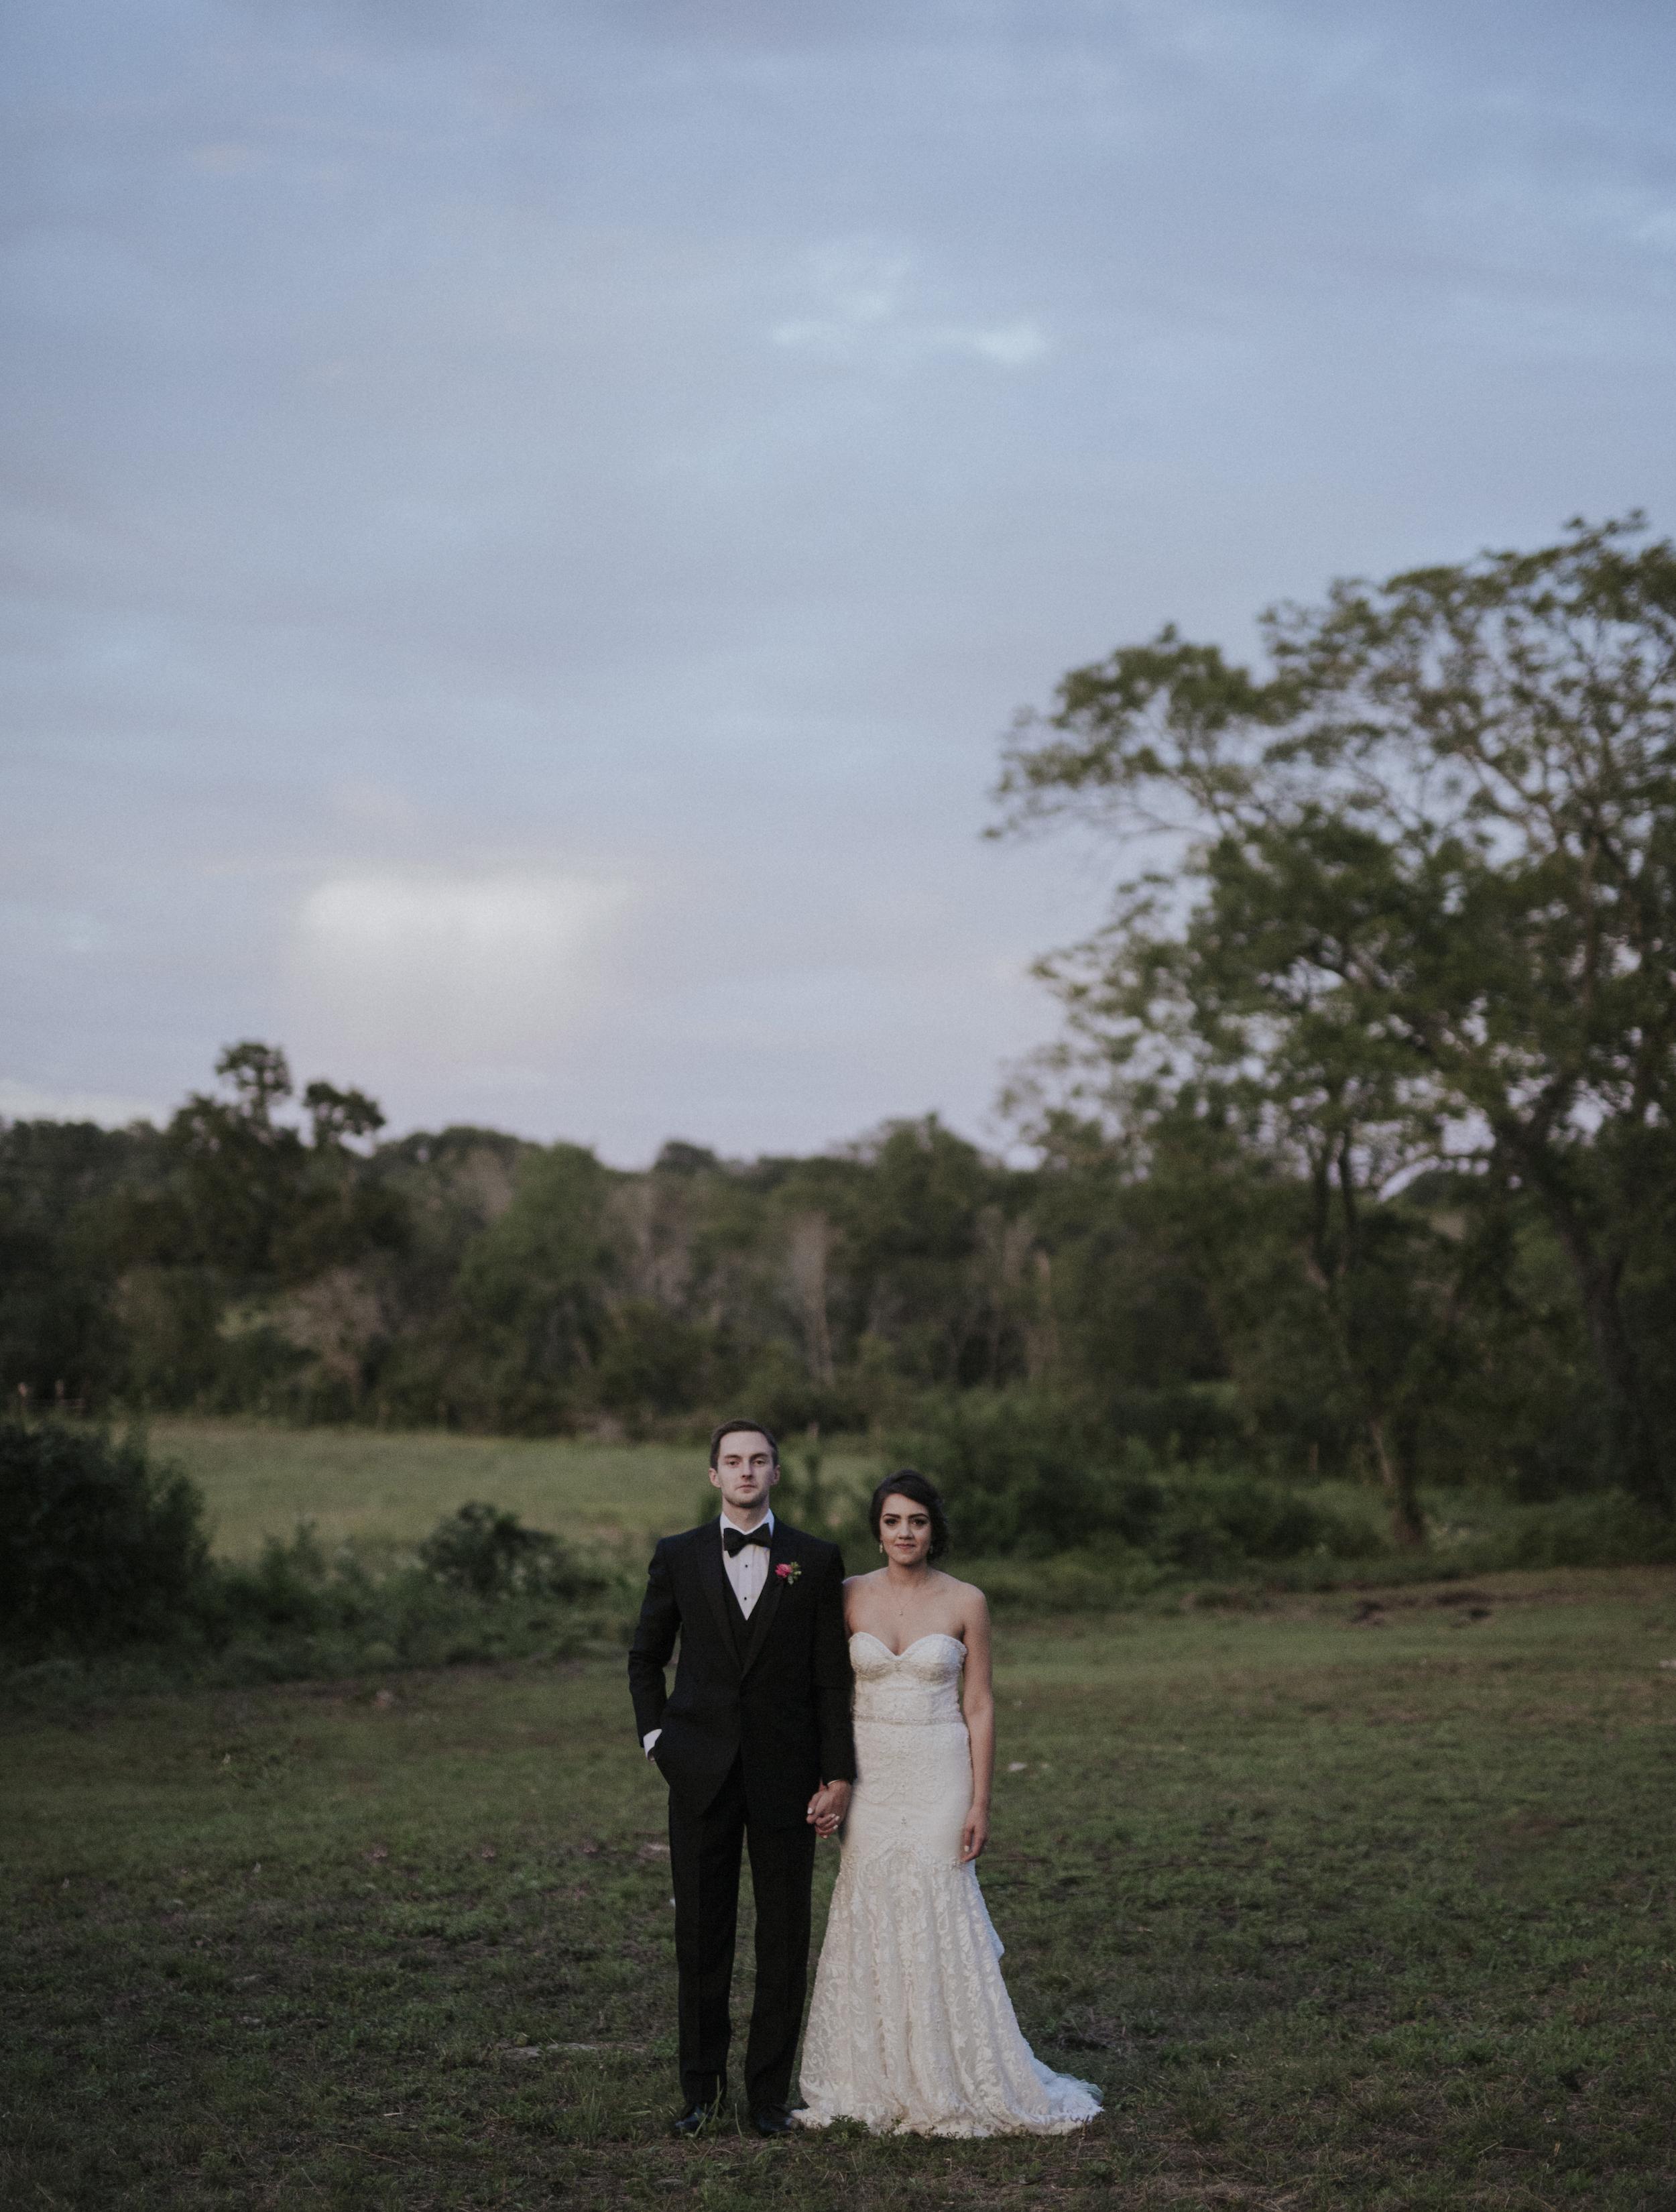 Garden Grove Wedding & Event Center5744.JPG